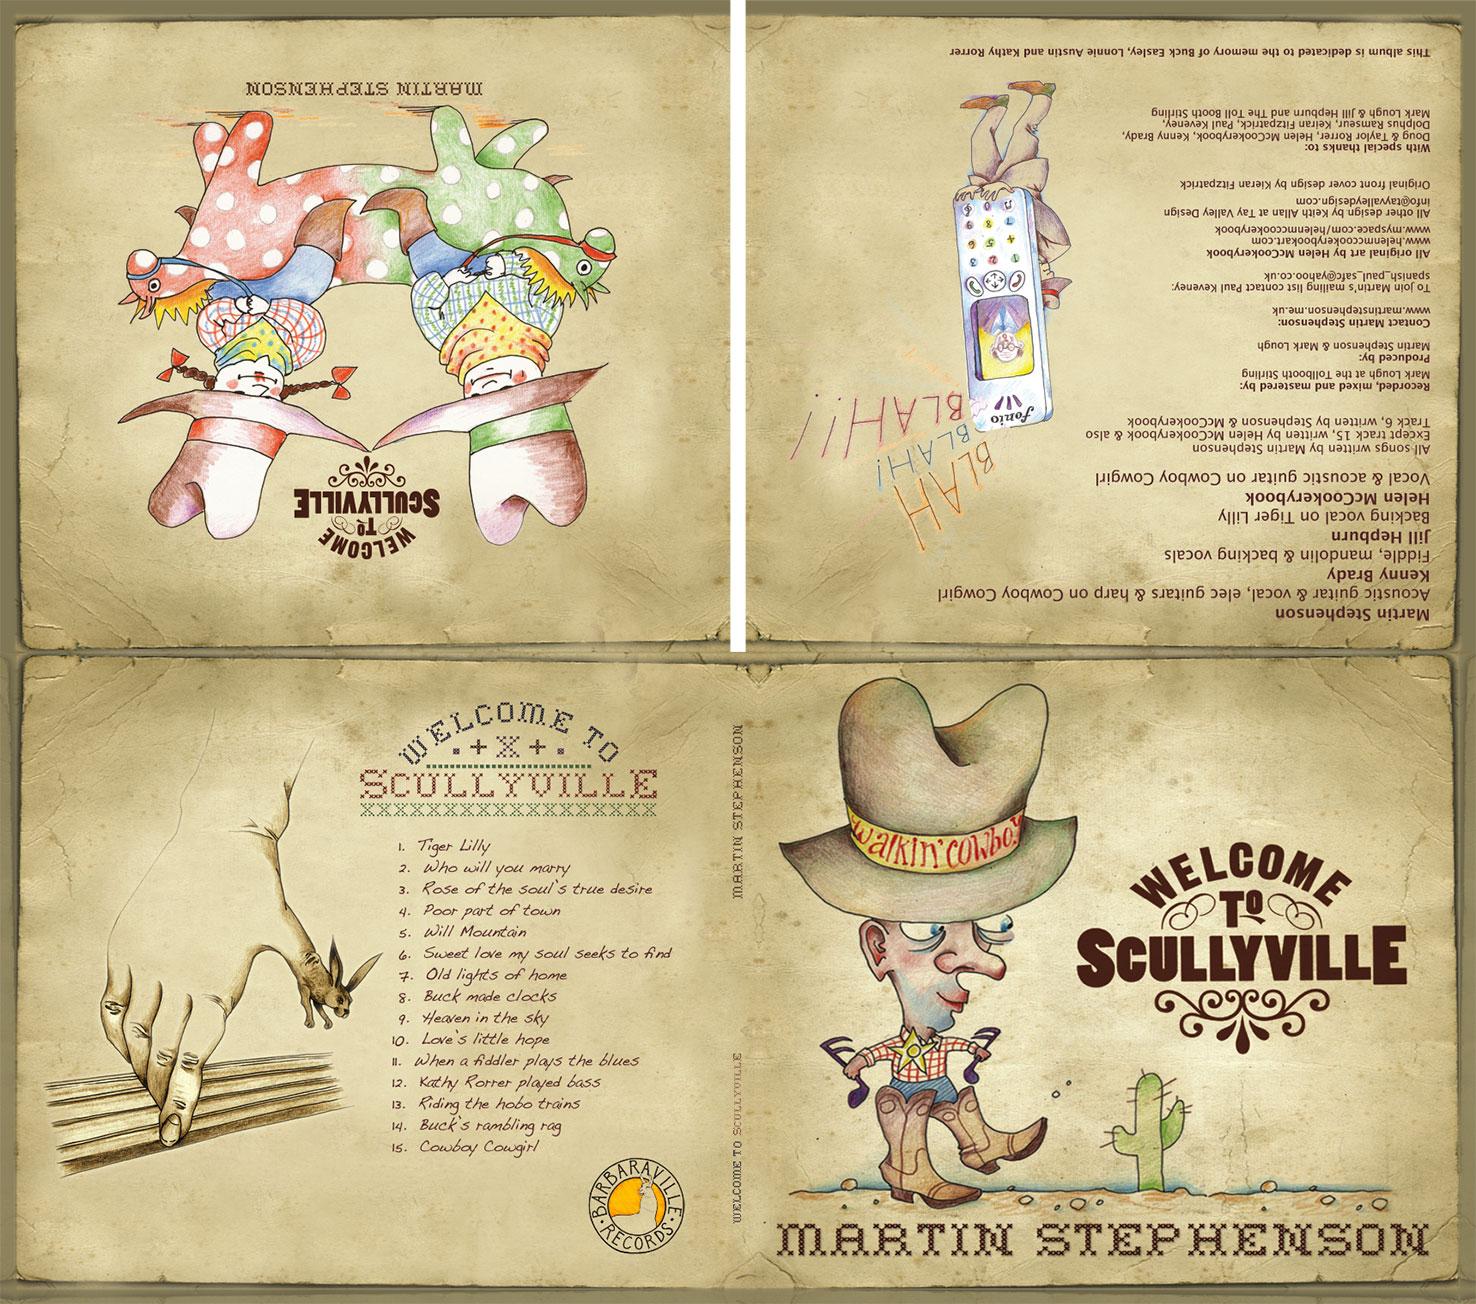 Martin-Stephenson-Album-2